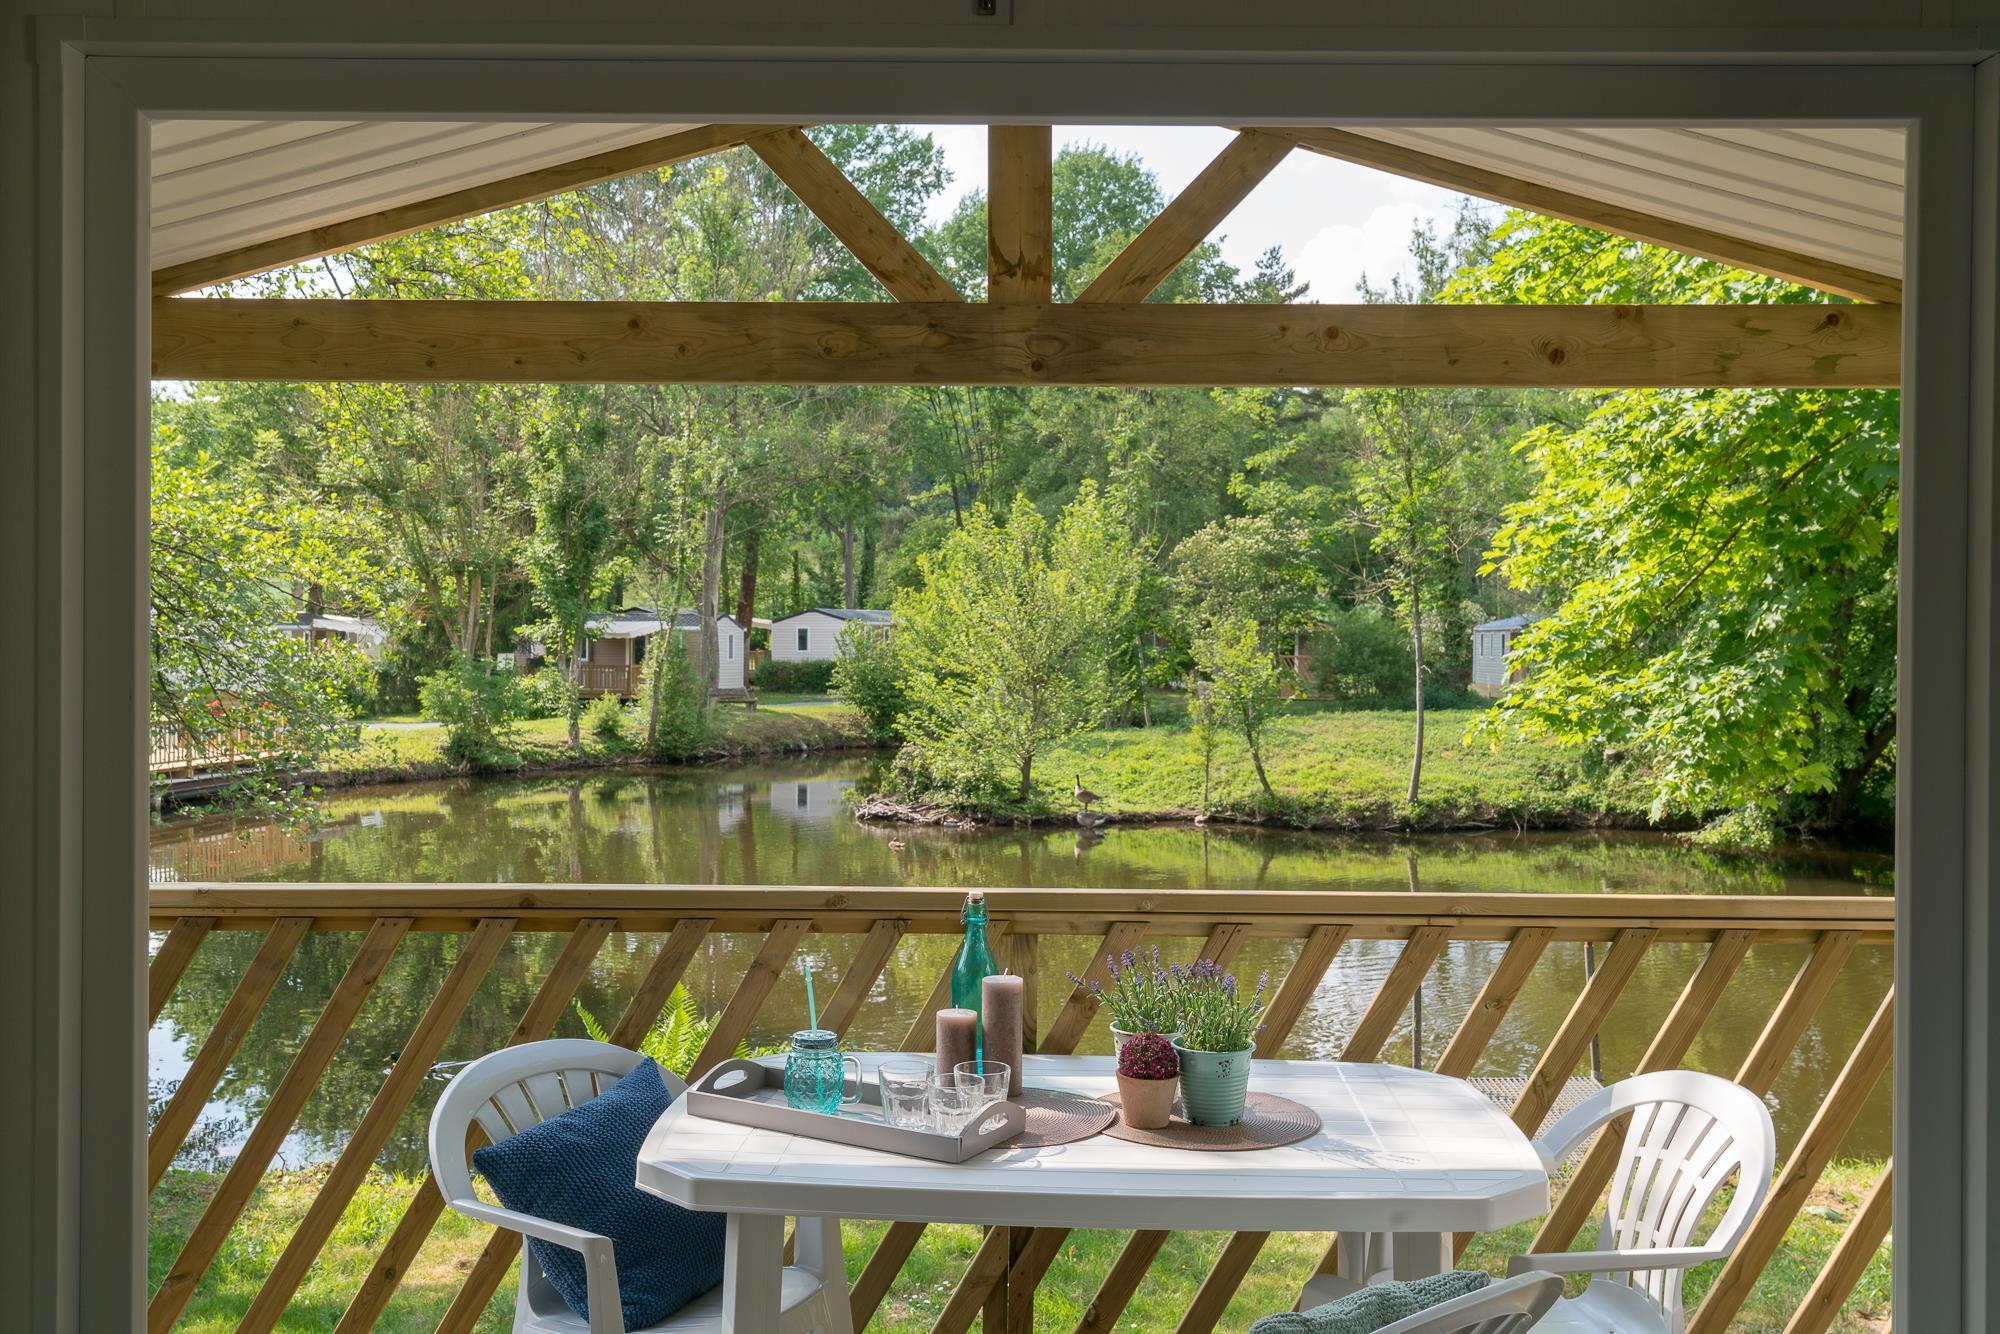 Location - Cottage Loggia Bay *** - 2 Chambres - Vue Lac - Camping Le Grand Paris